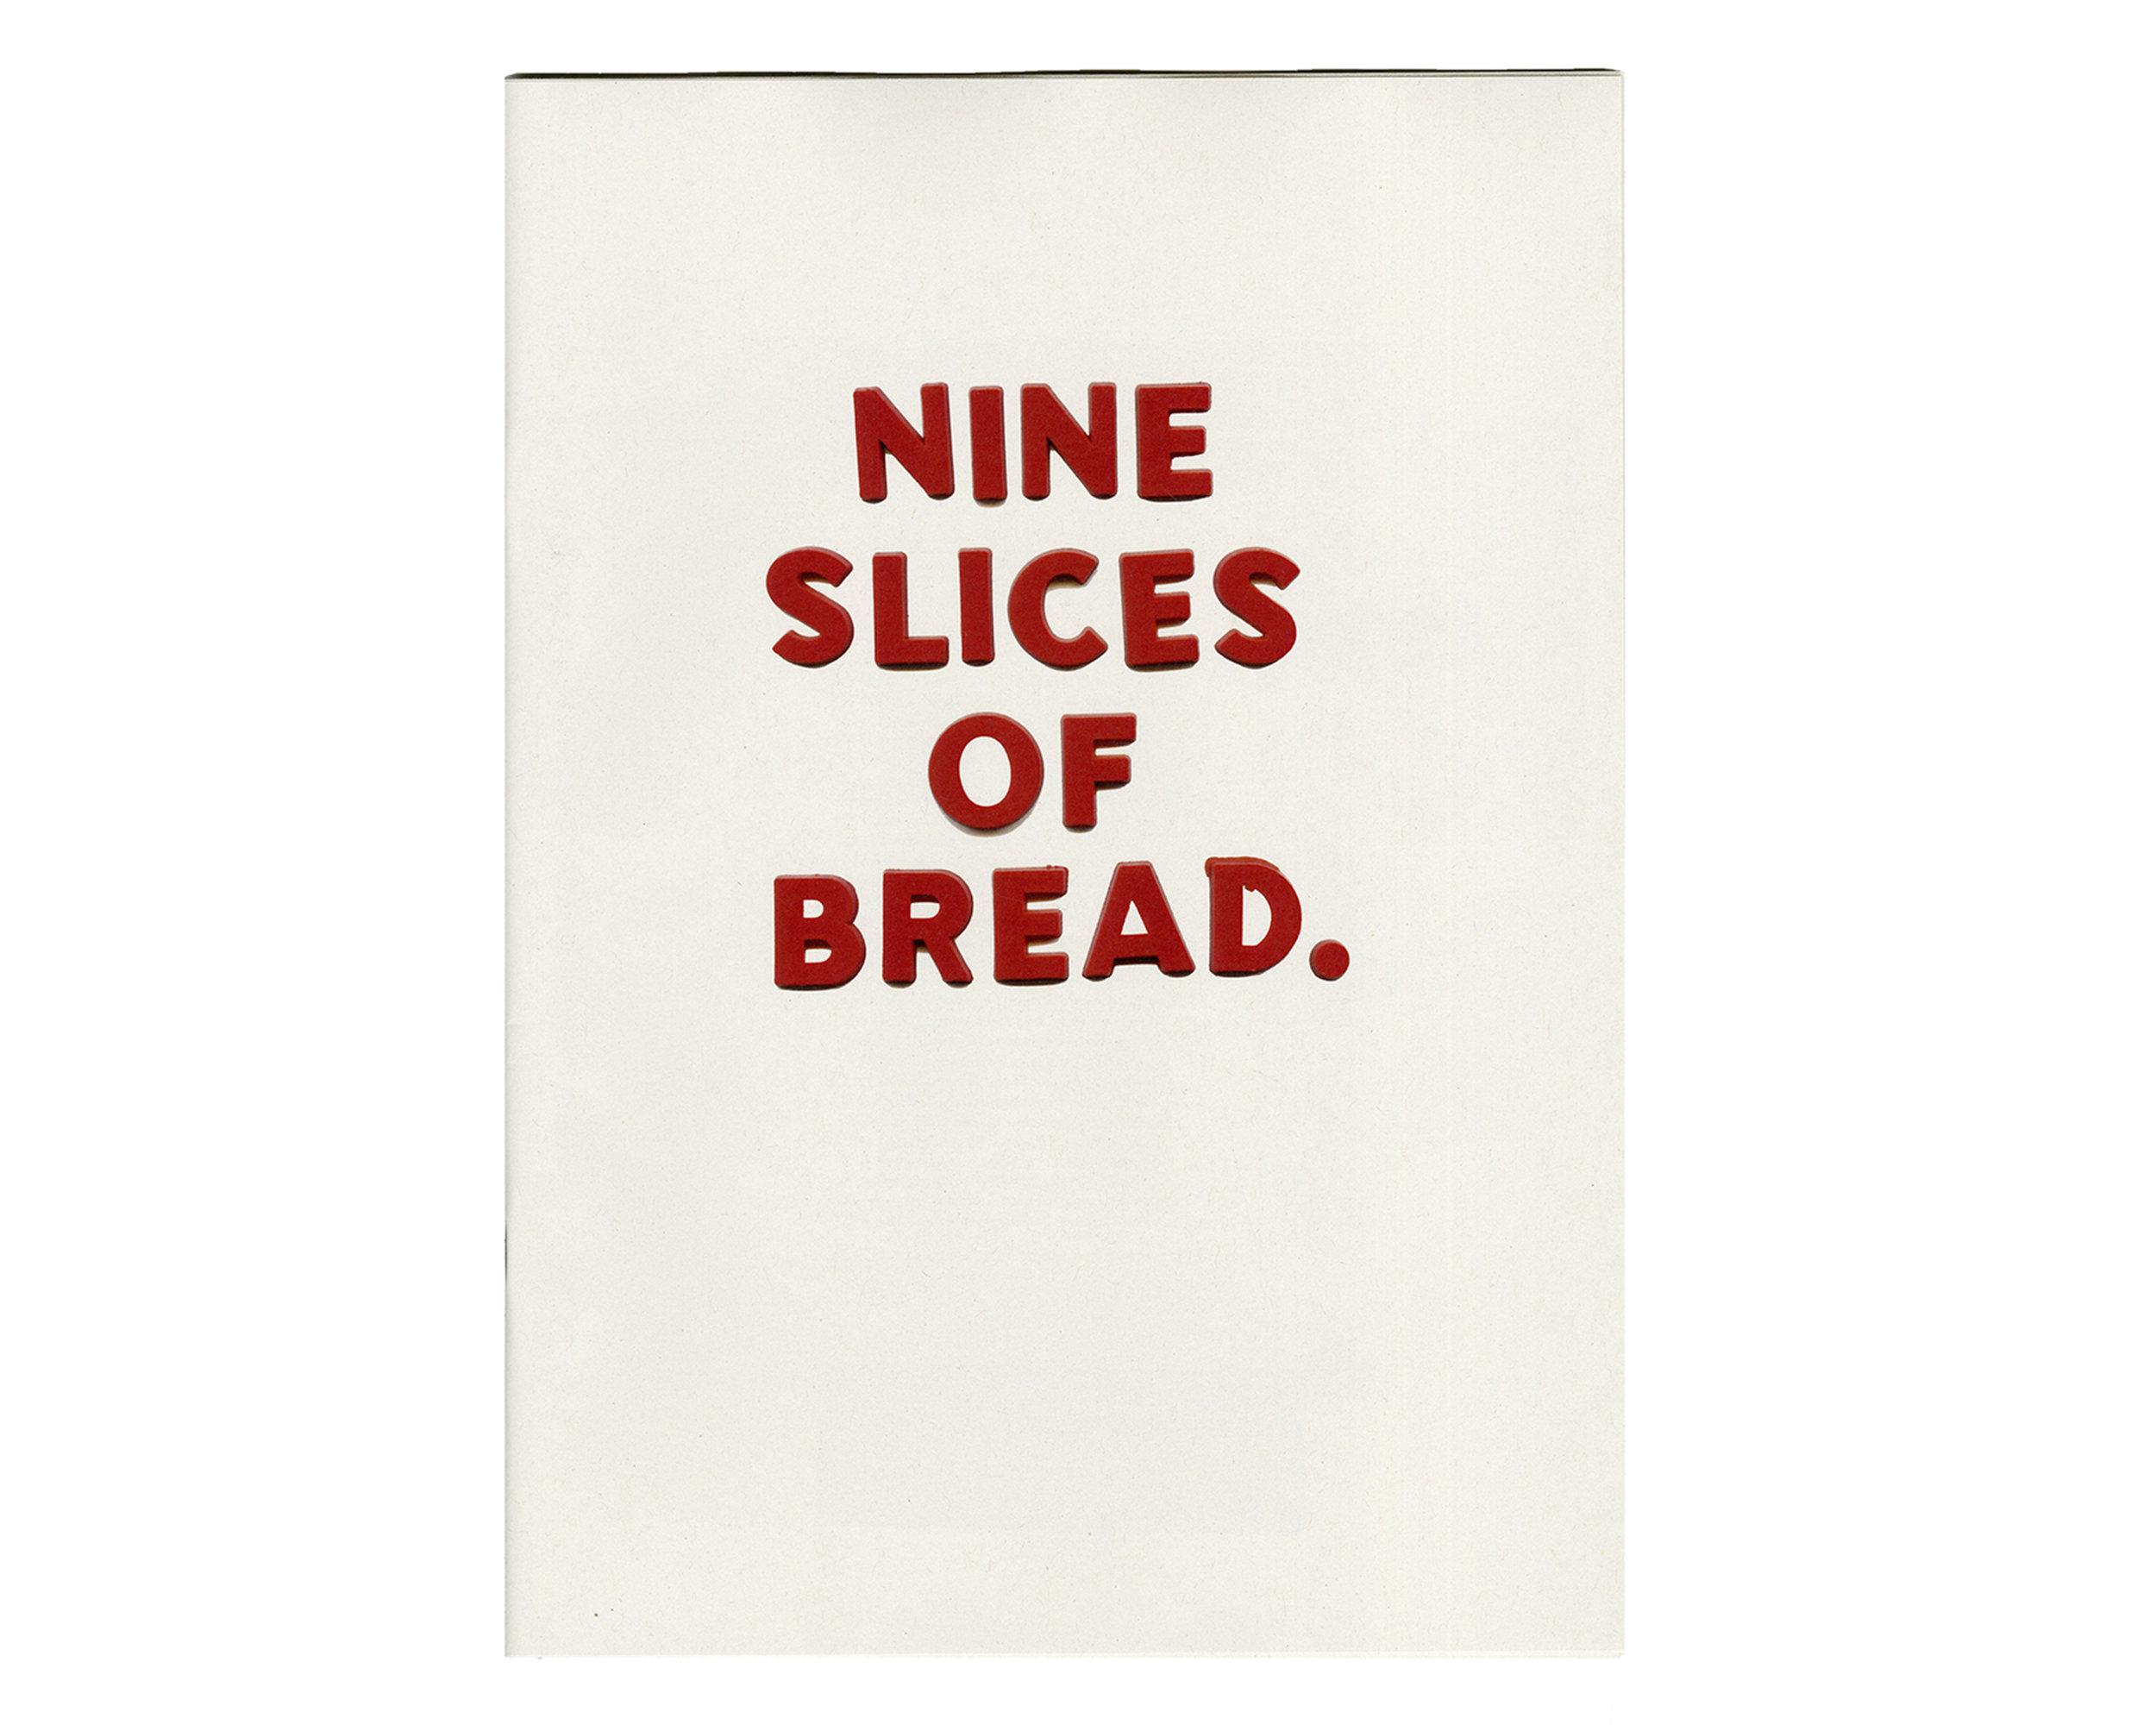 Nine Slices 10x8 web.jpg